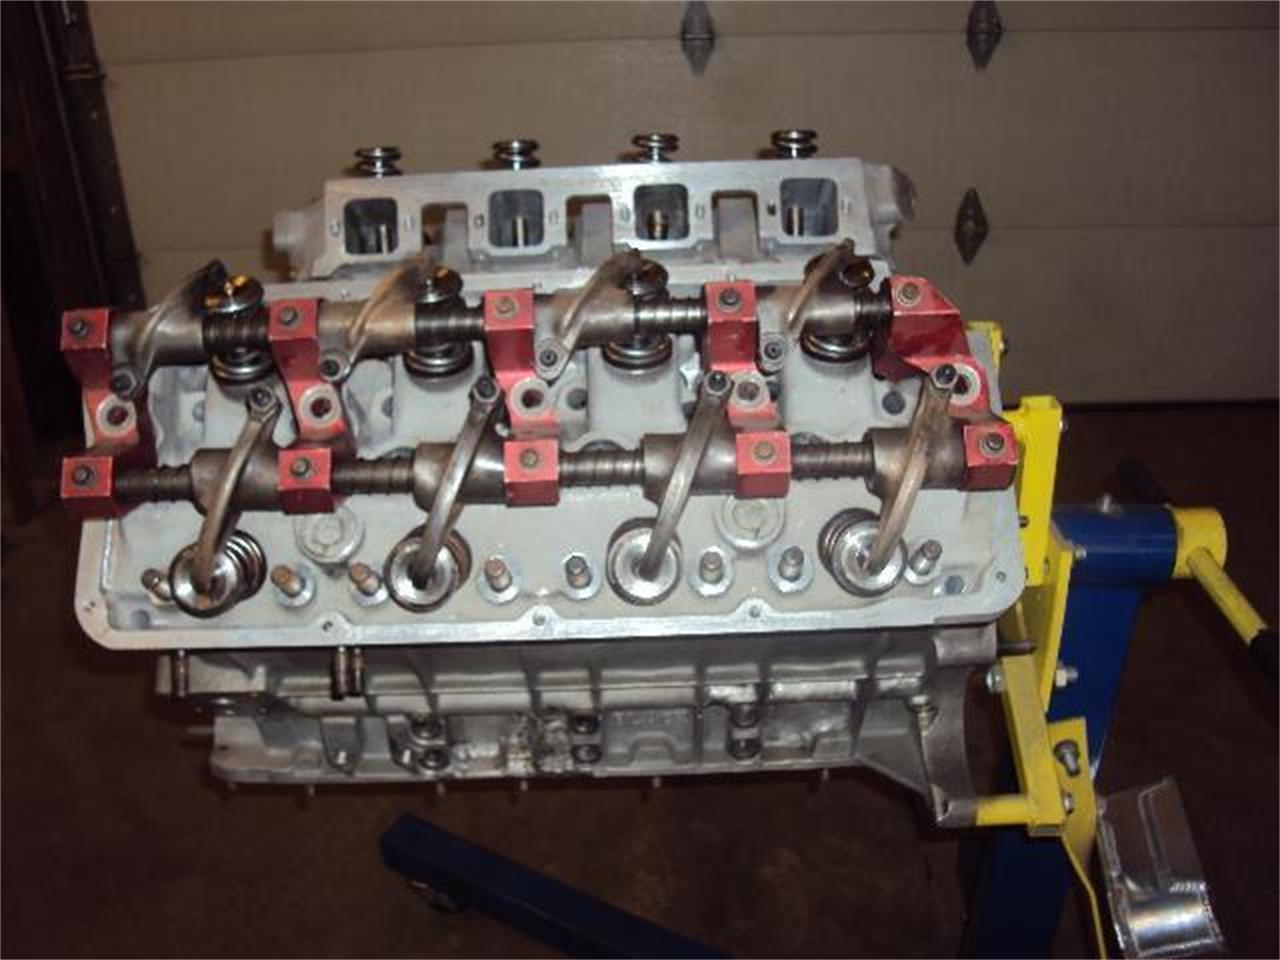 Large Picture of Classic '69 hemi engs parts hemi stuff mis Auction Vehicle - 7P5A